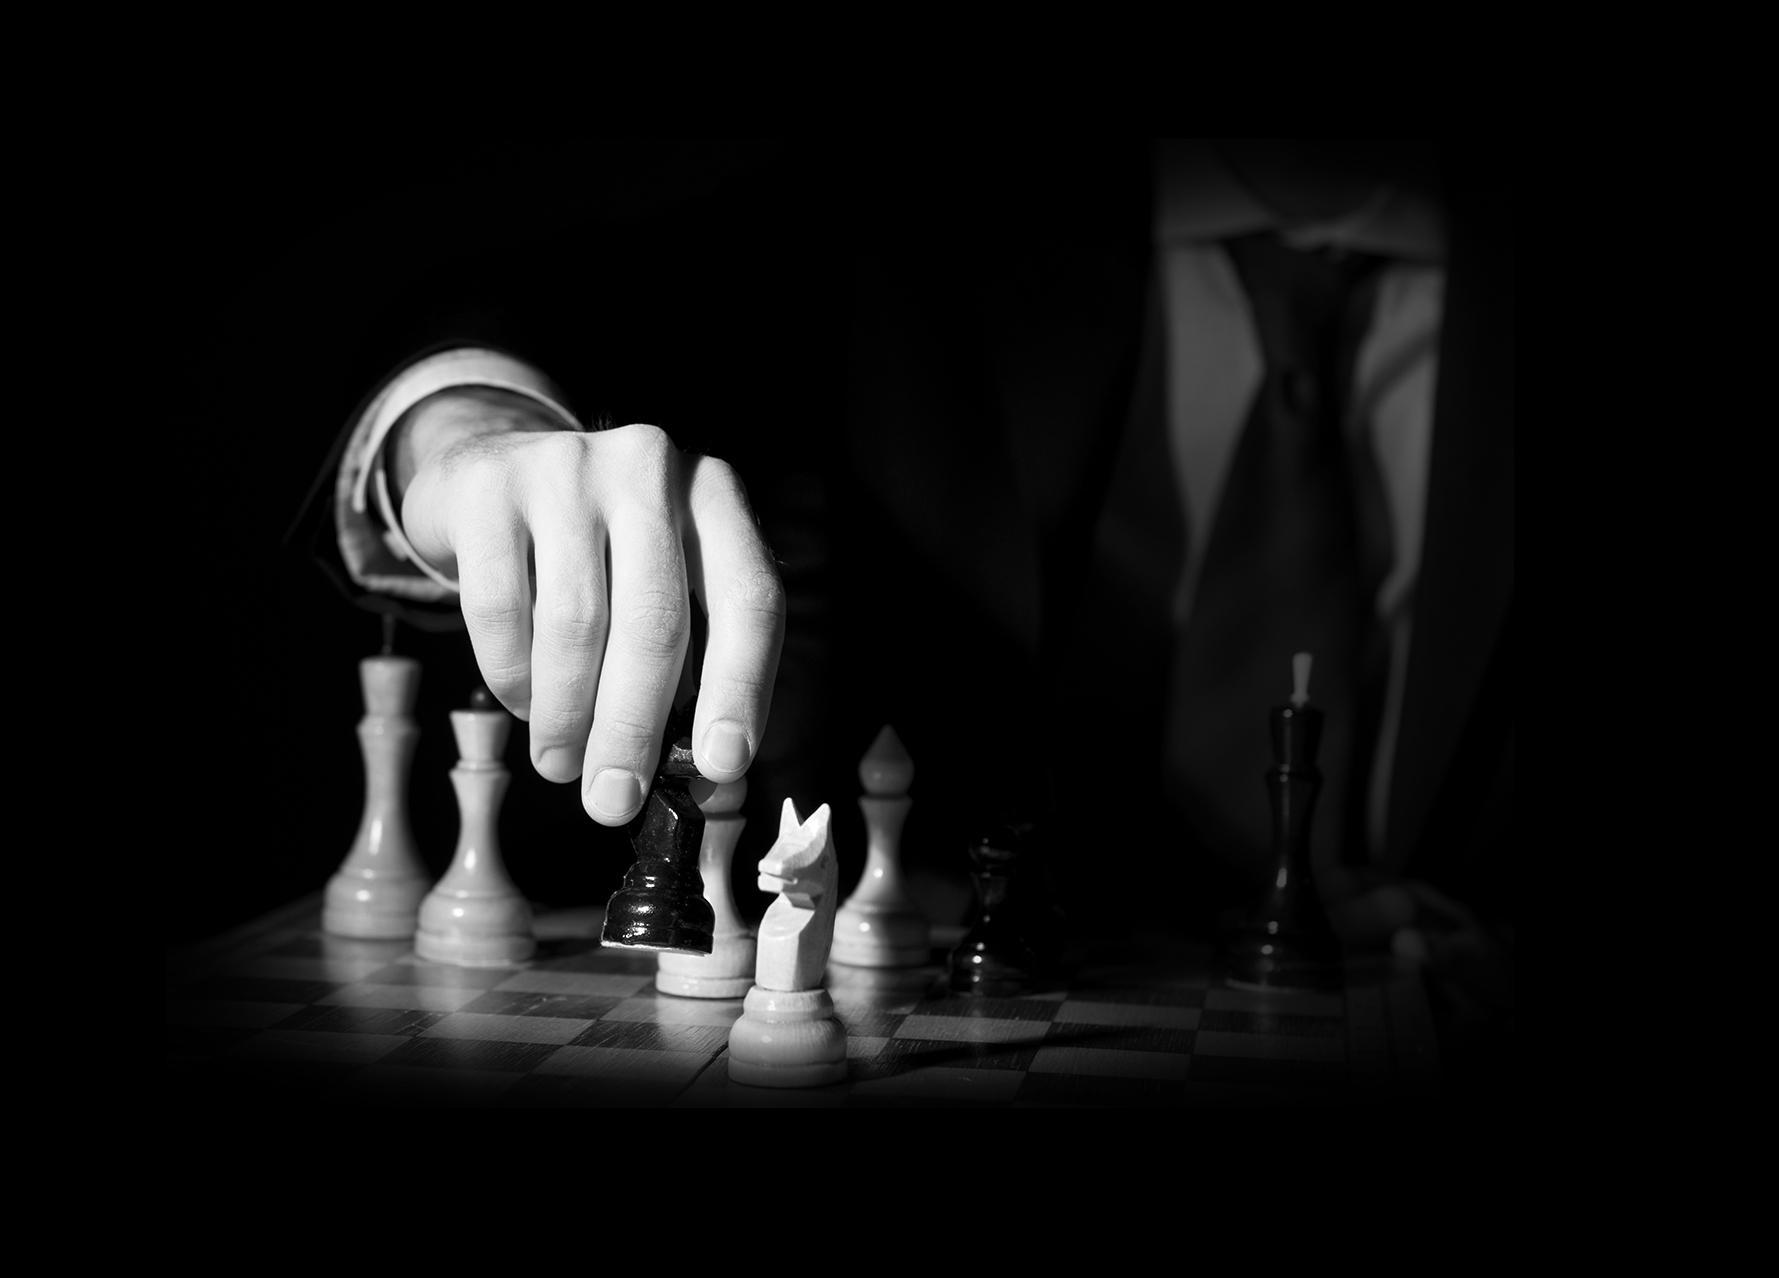 Cld_imgs_chess-pieni-1 %%sep%% %%sitename%%